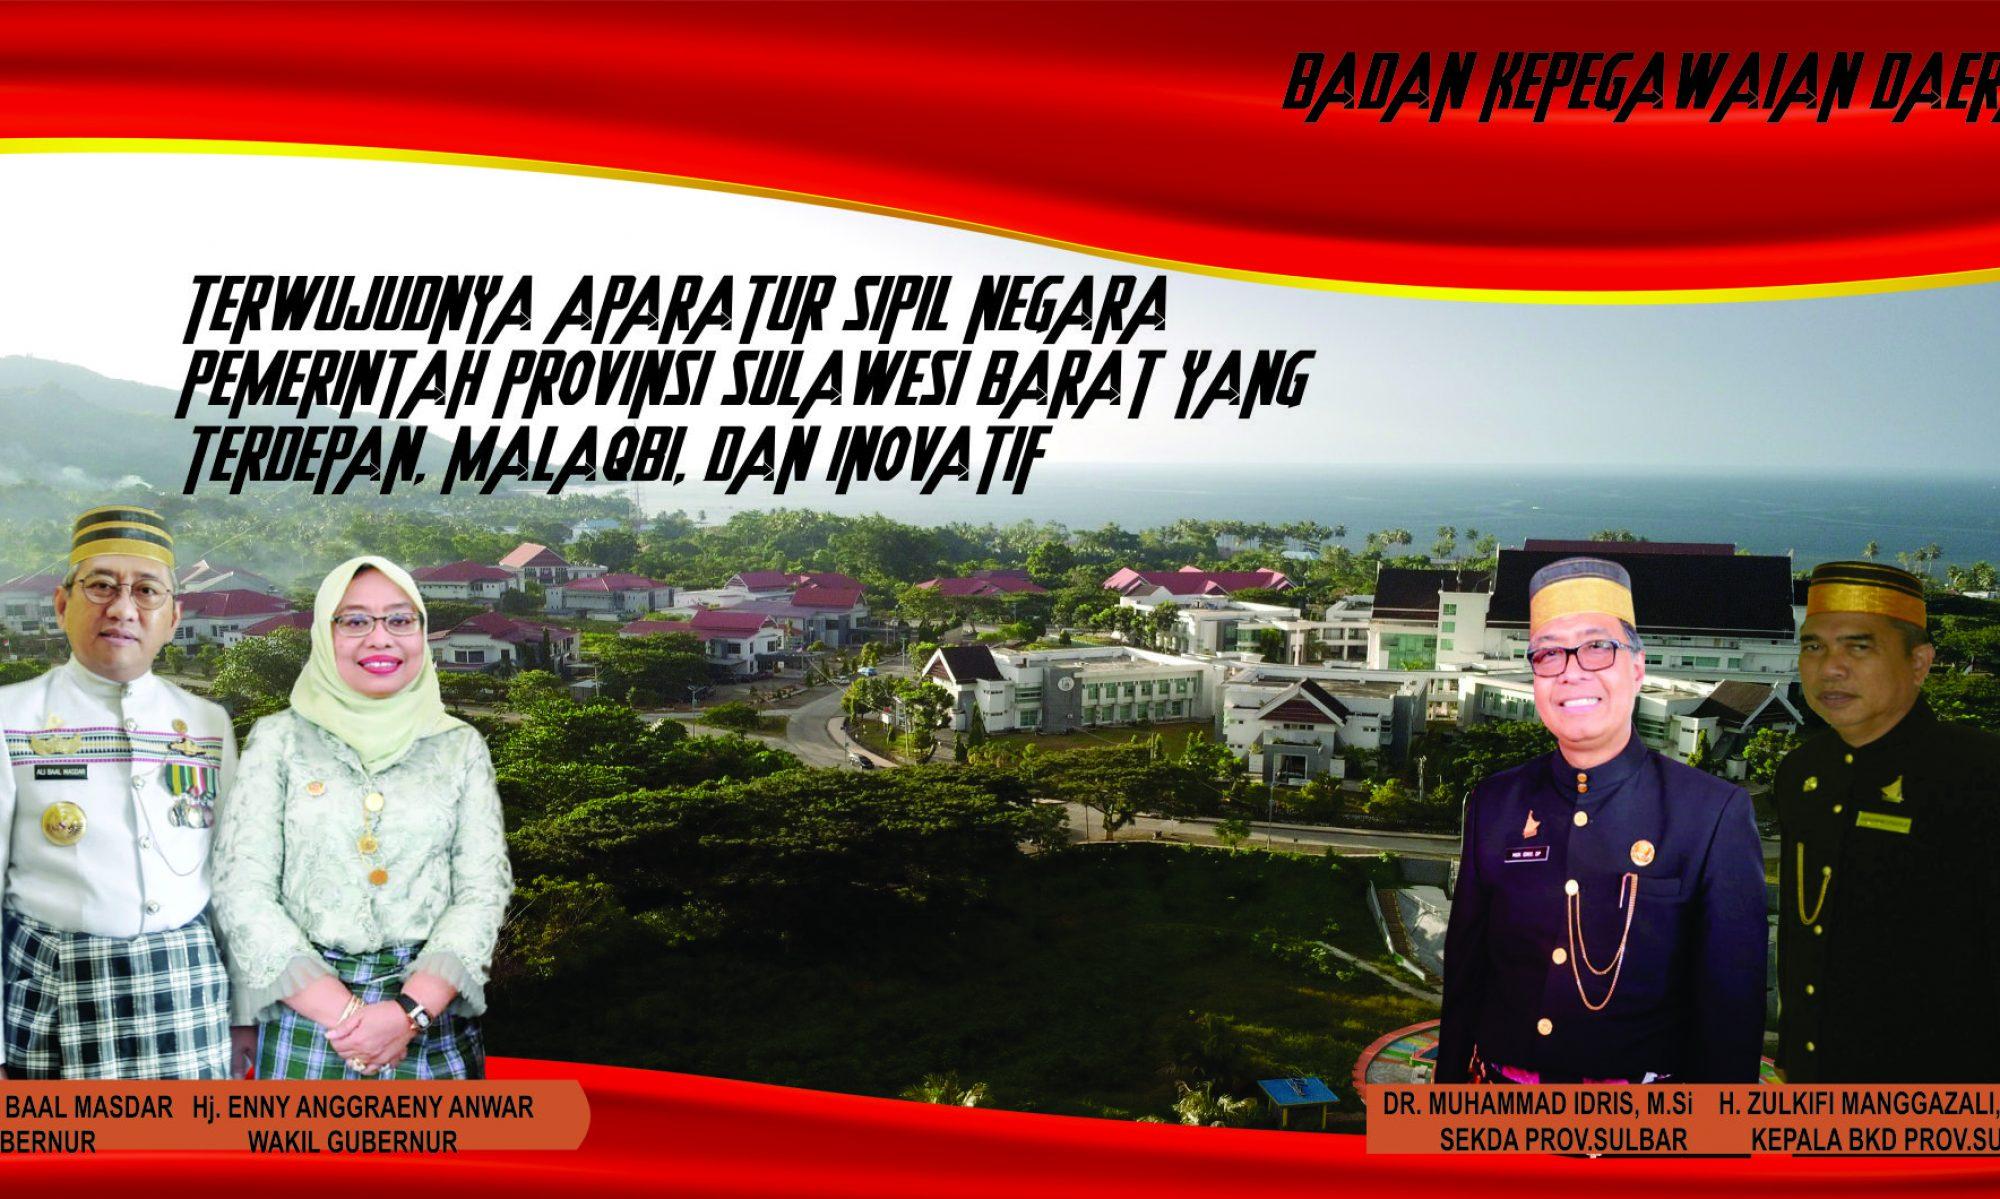 Badan Kepegawaian daerah